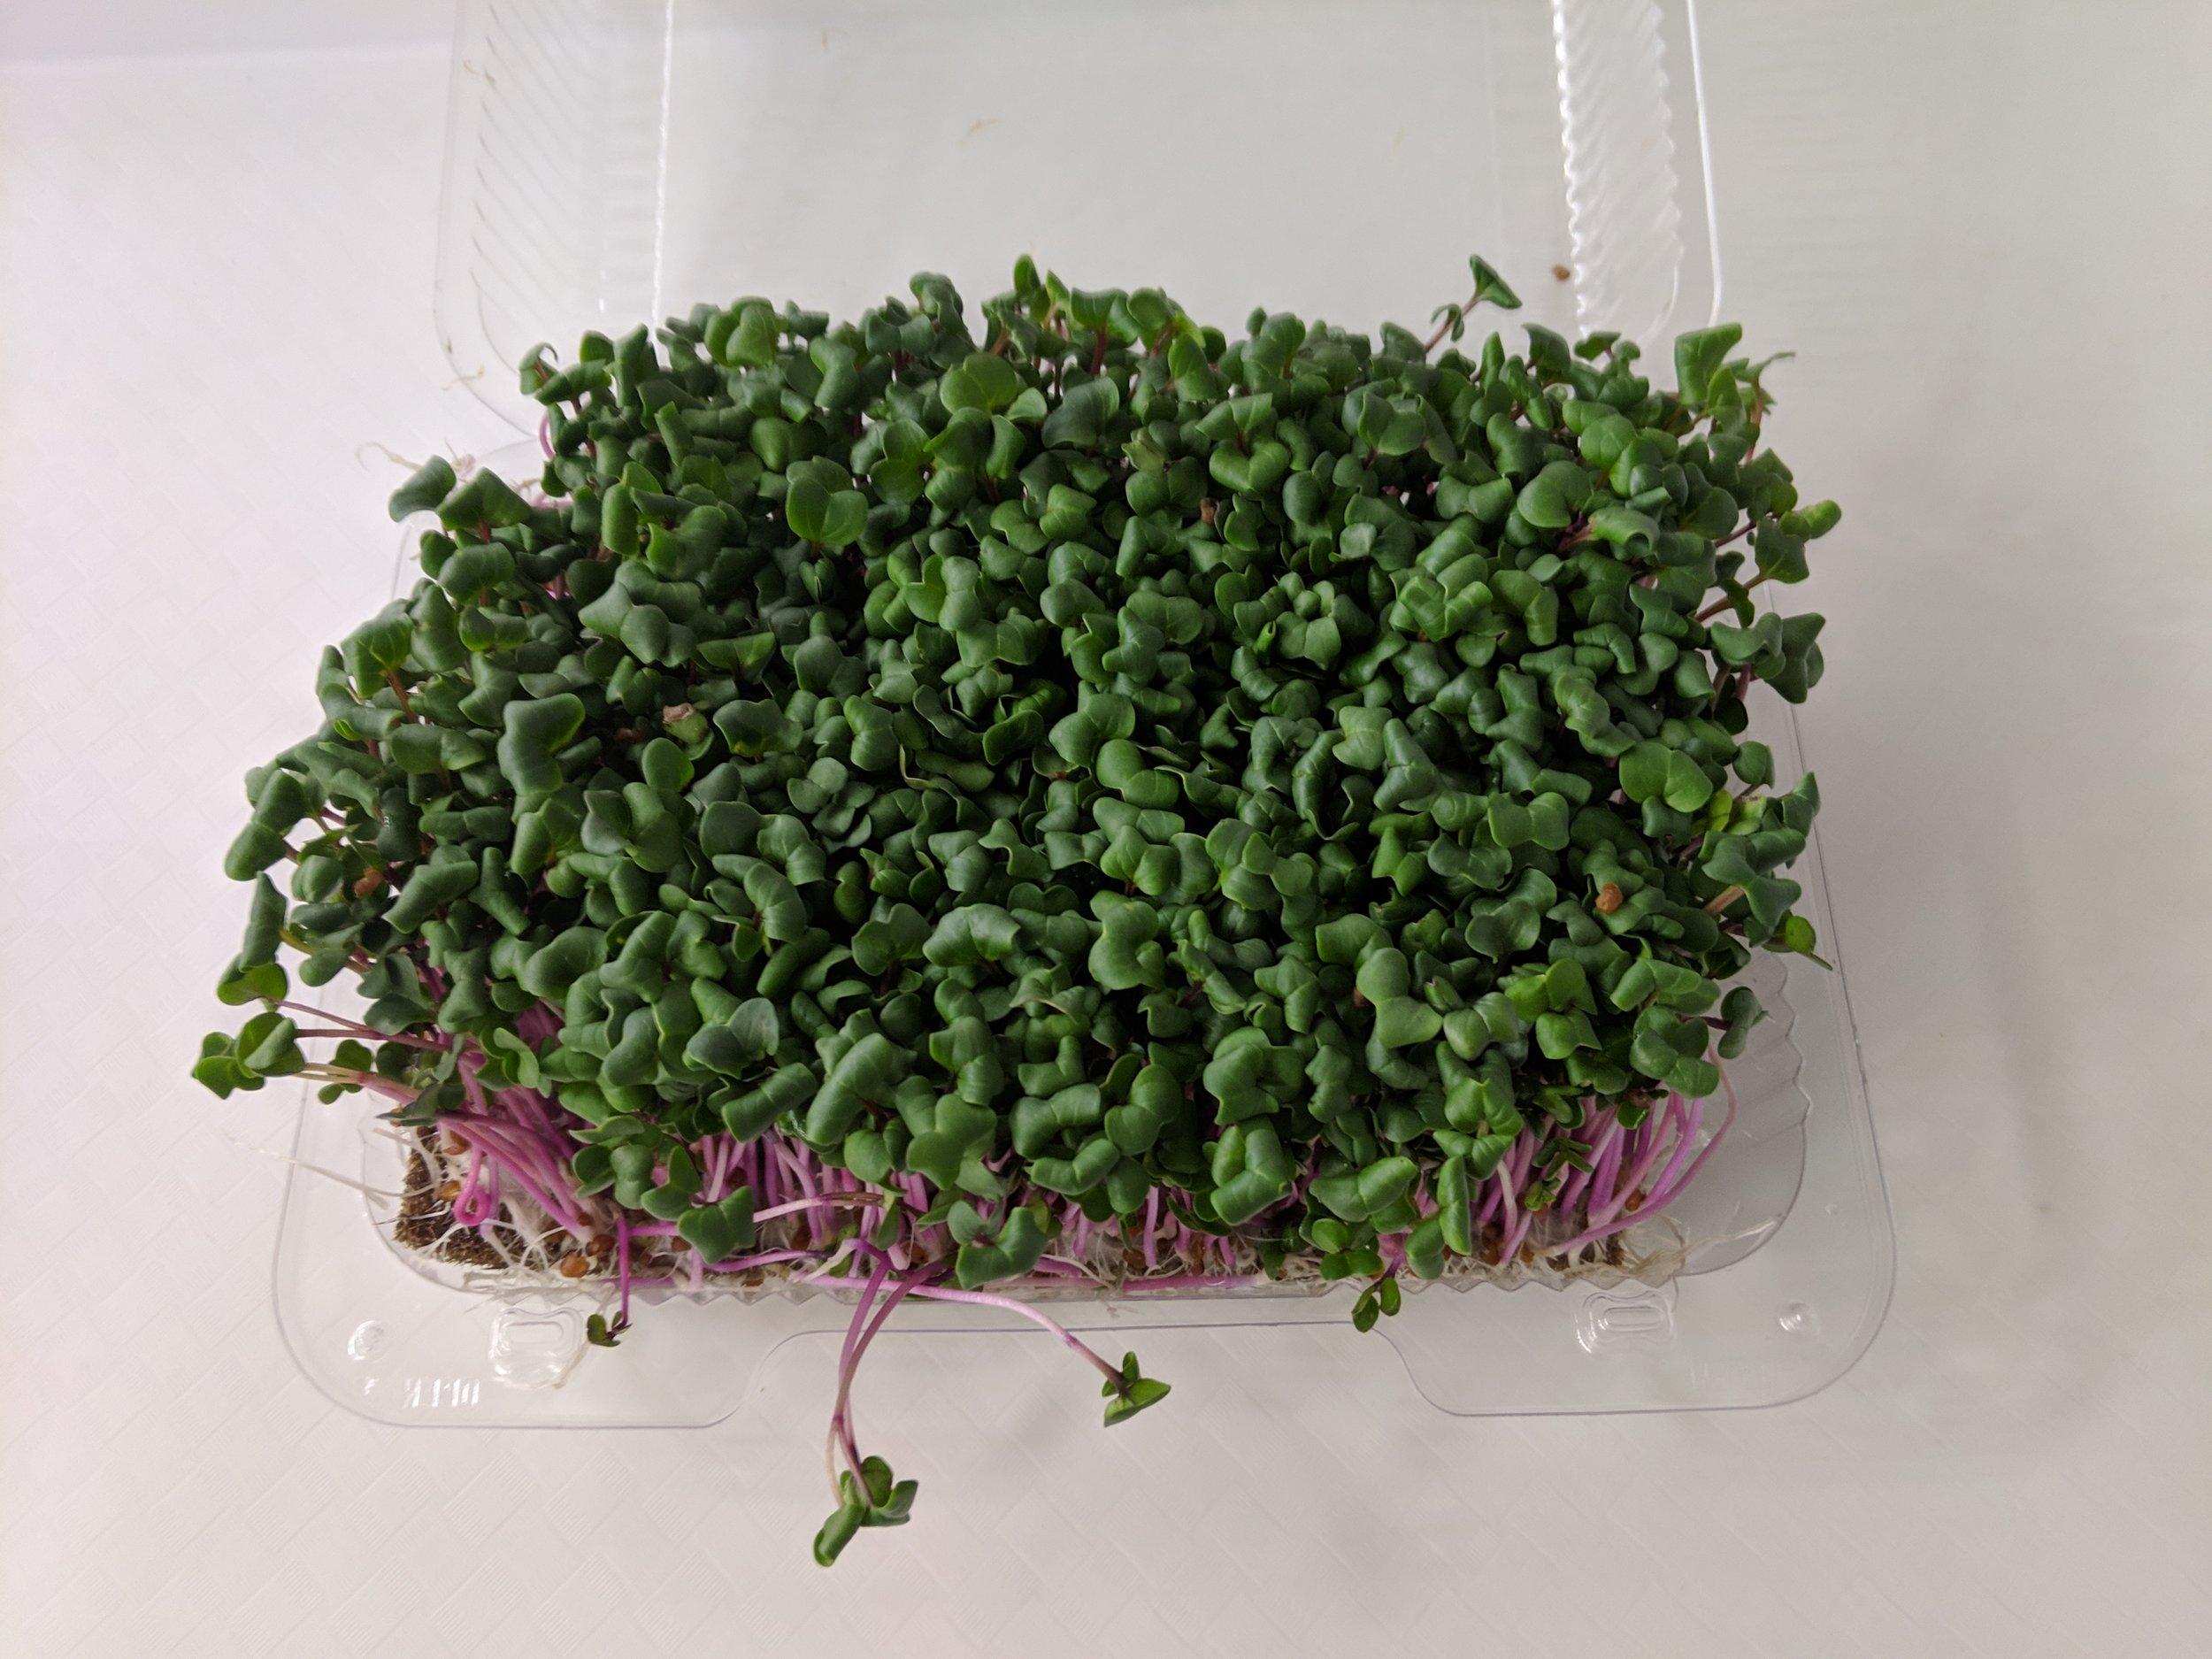 Fresh, Living Microgreens! -